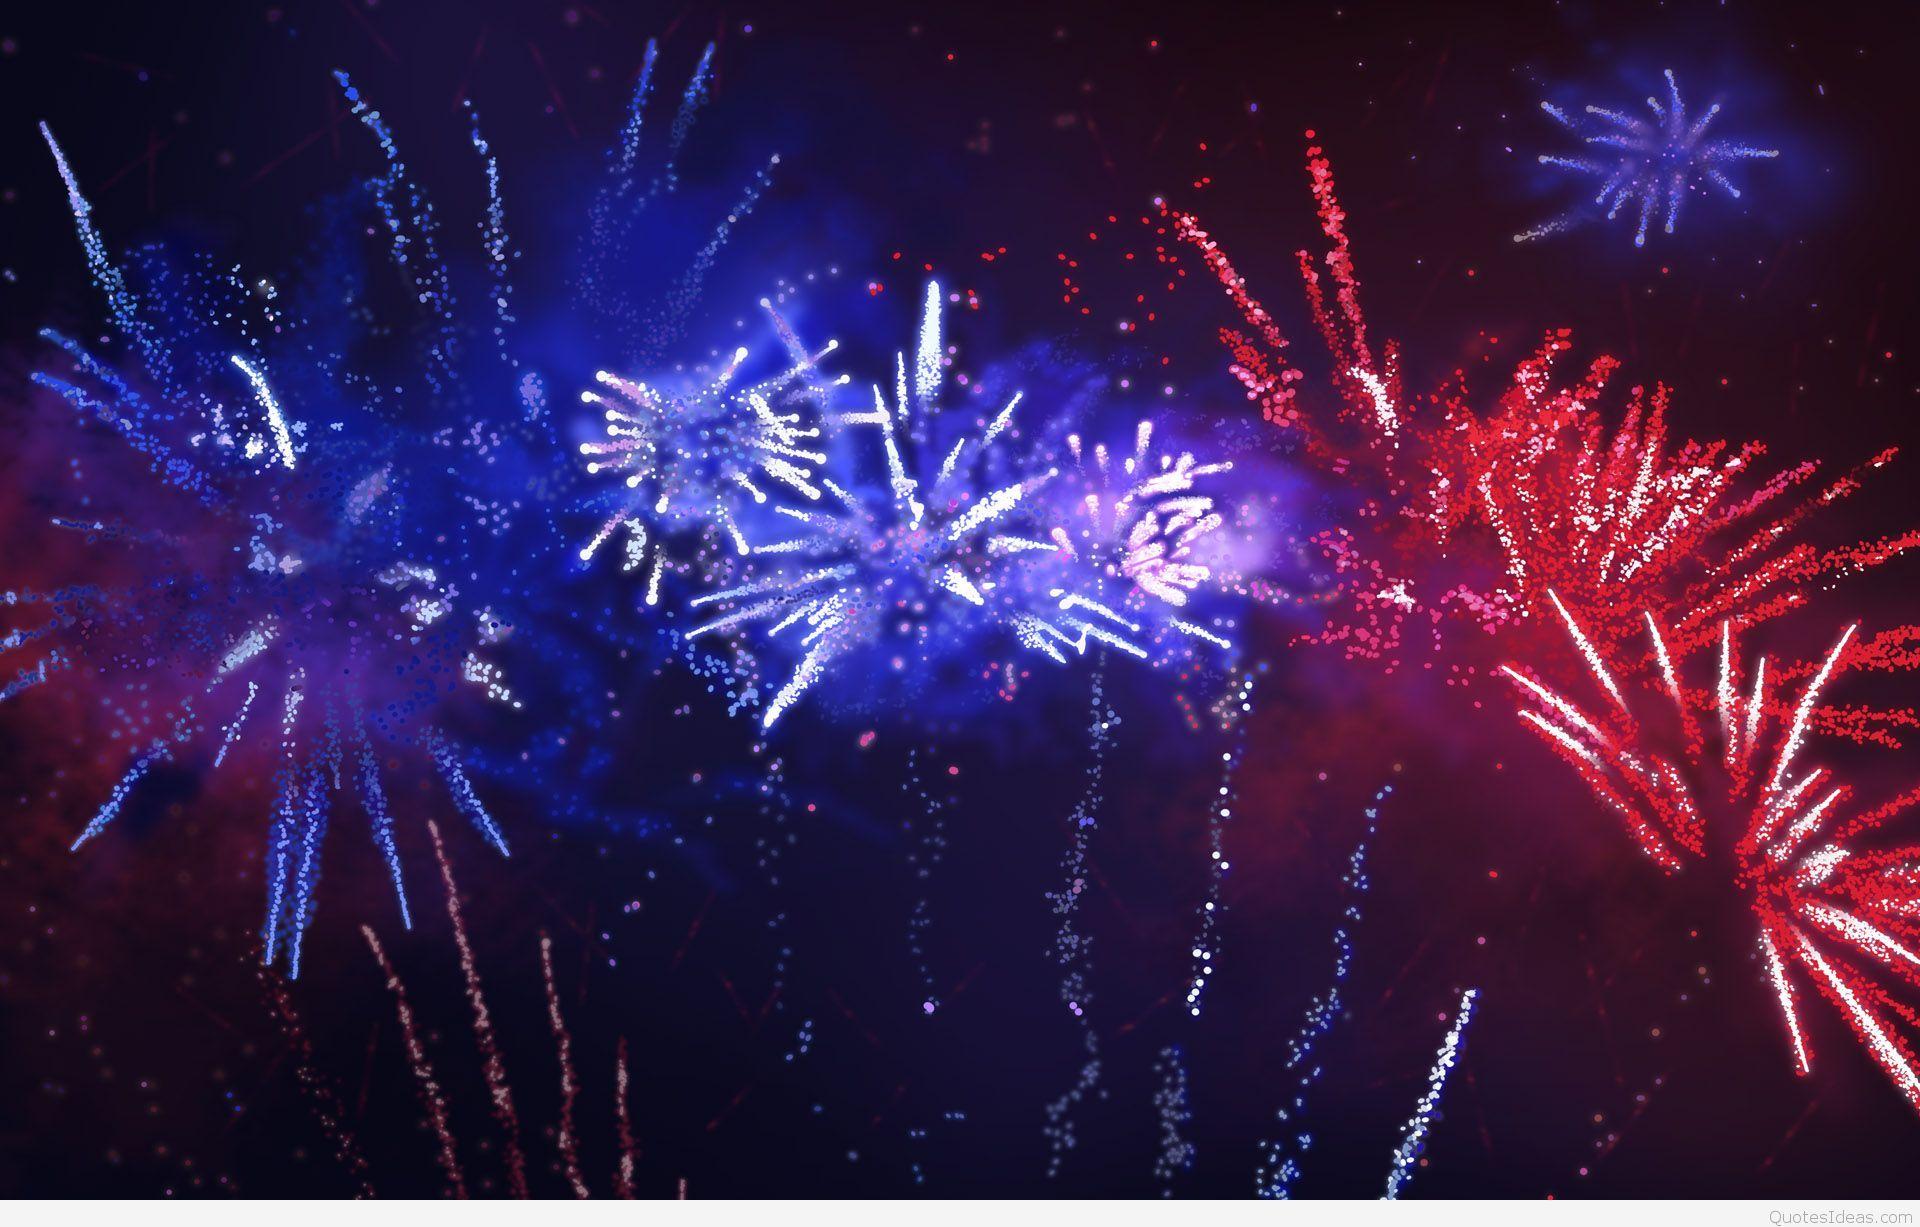 Wallpaper Weekends Fireworks MacTrast 1920x1227 41 Wallpapers